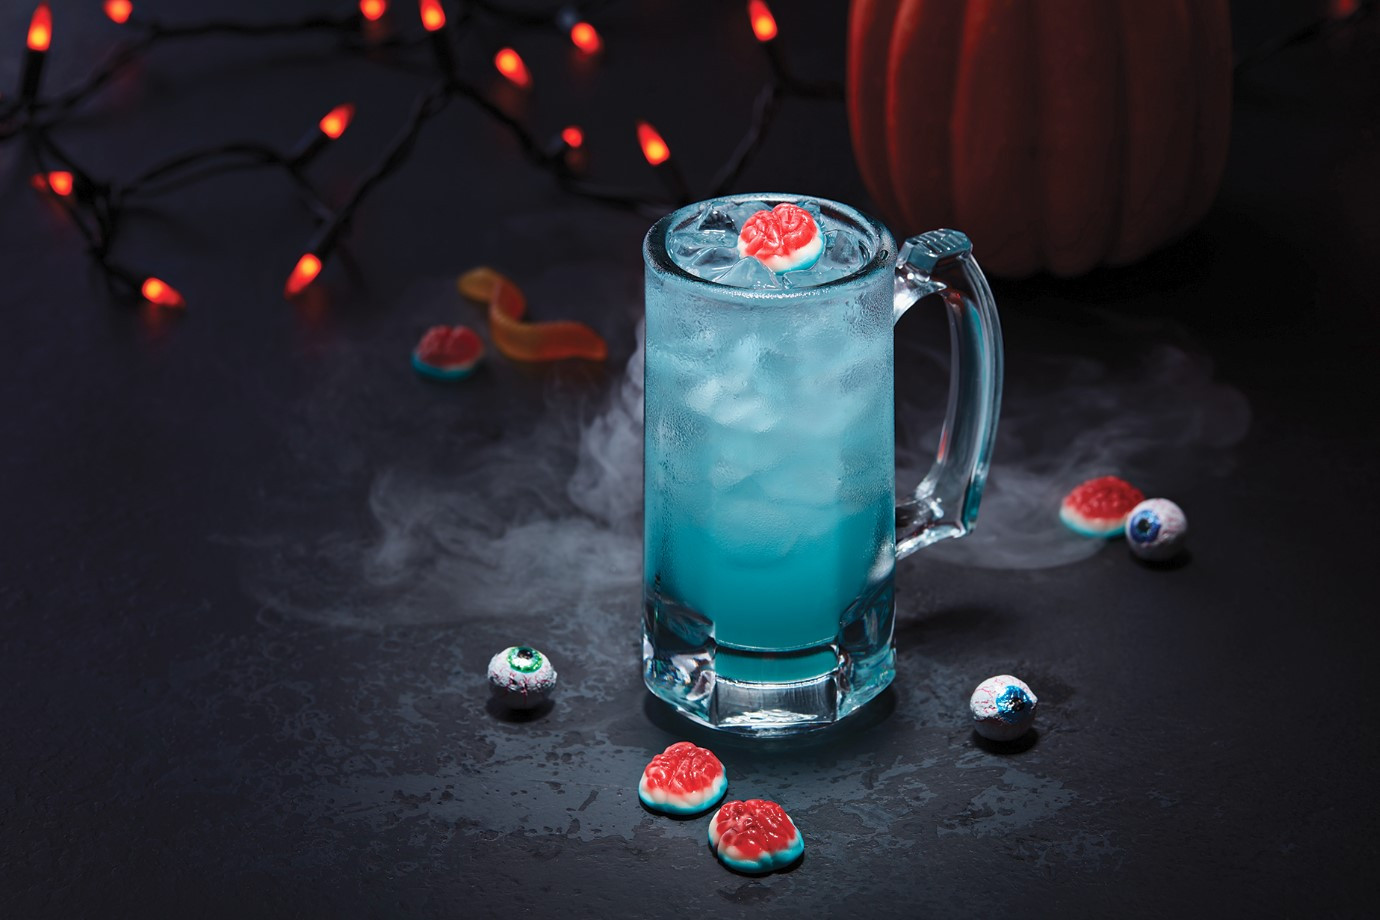 Applebees Halloween Drinks  Applebee s $2 Samuel Adams OctoberFest Month